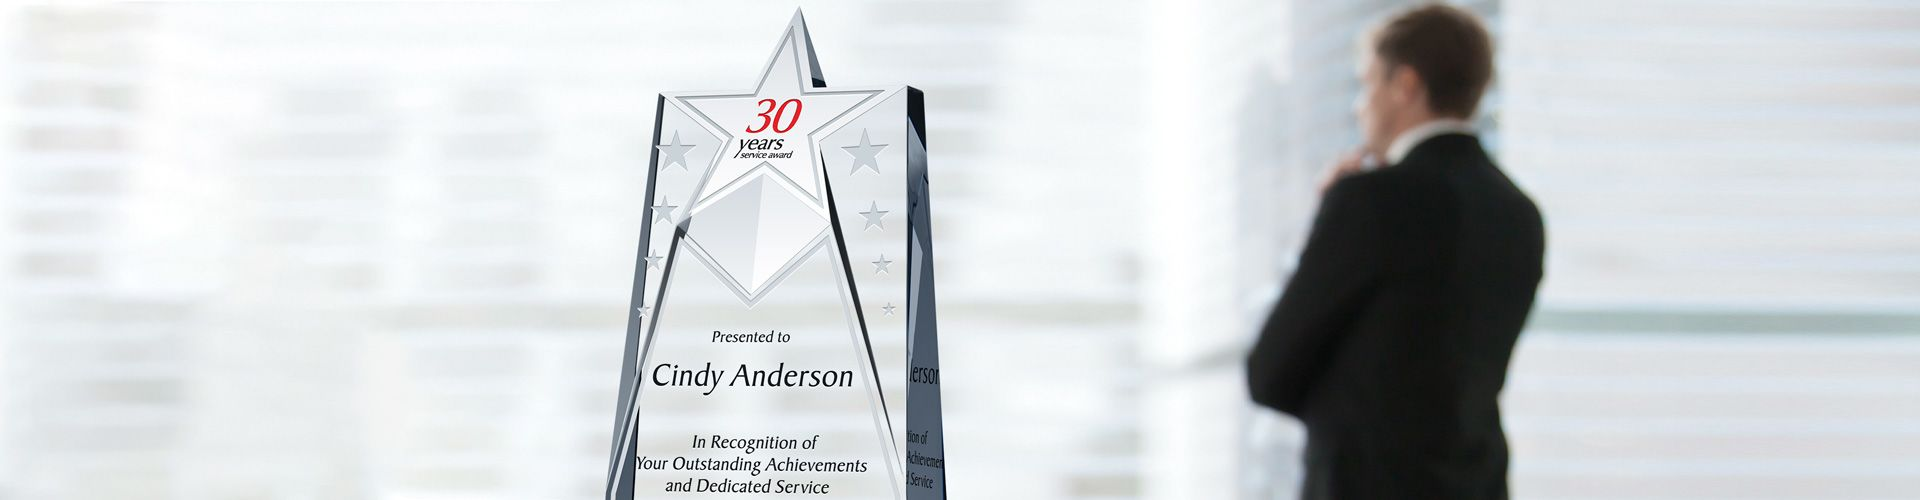 Years of Service Award Plaque Wording Ideas | DIY Awards